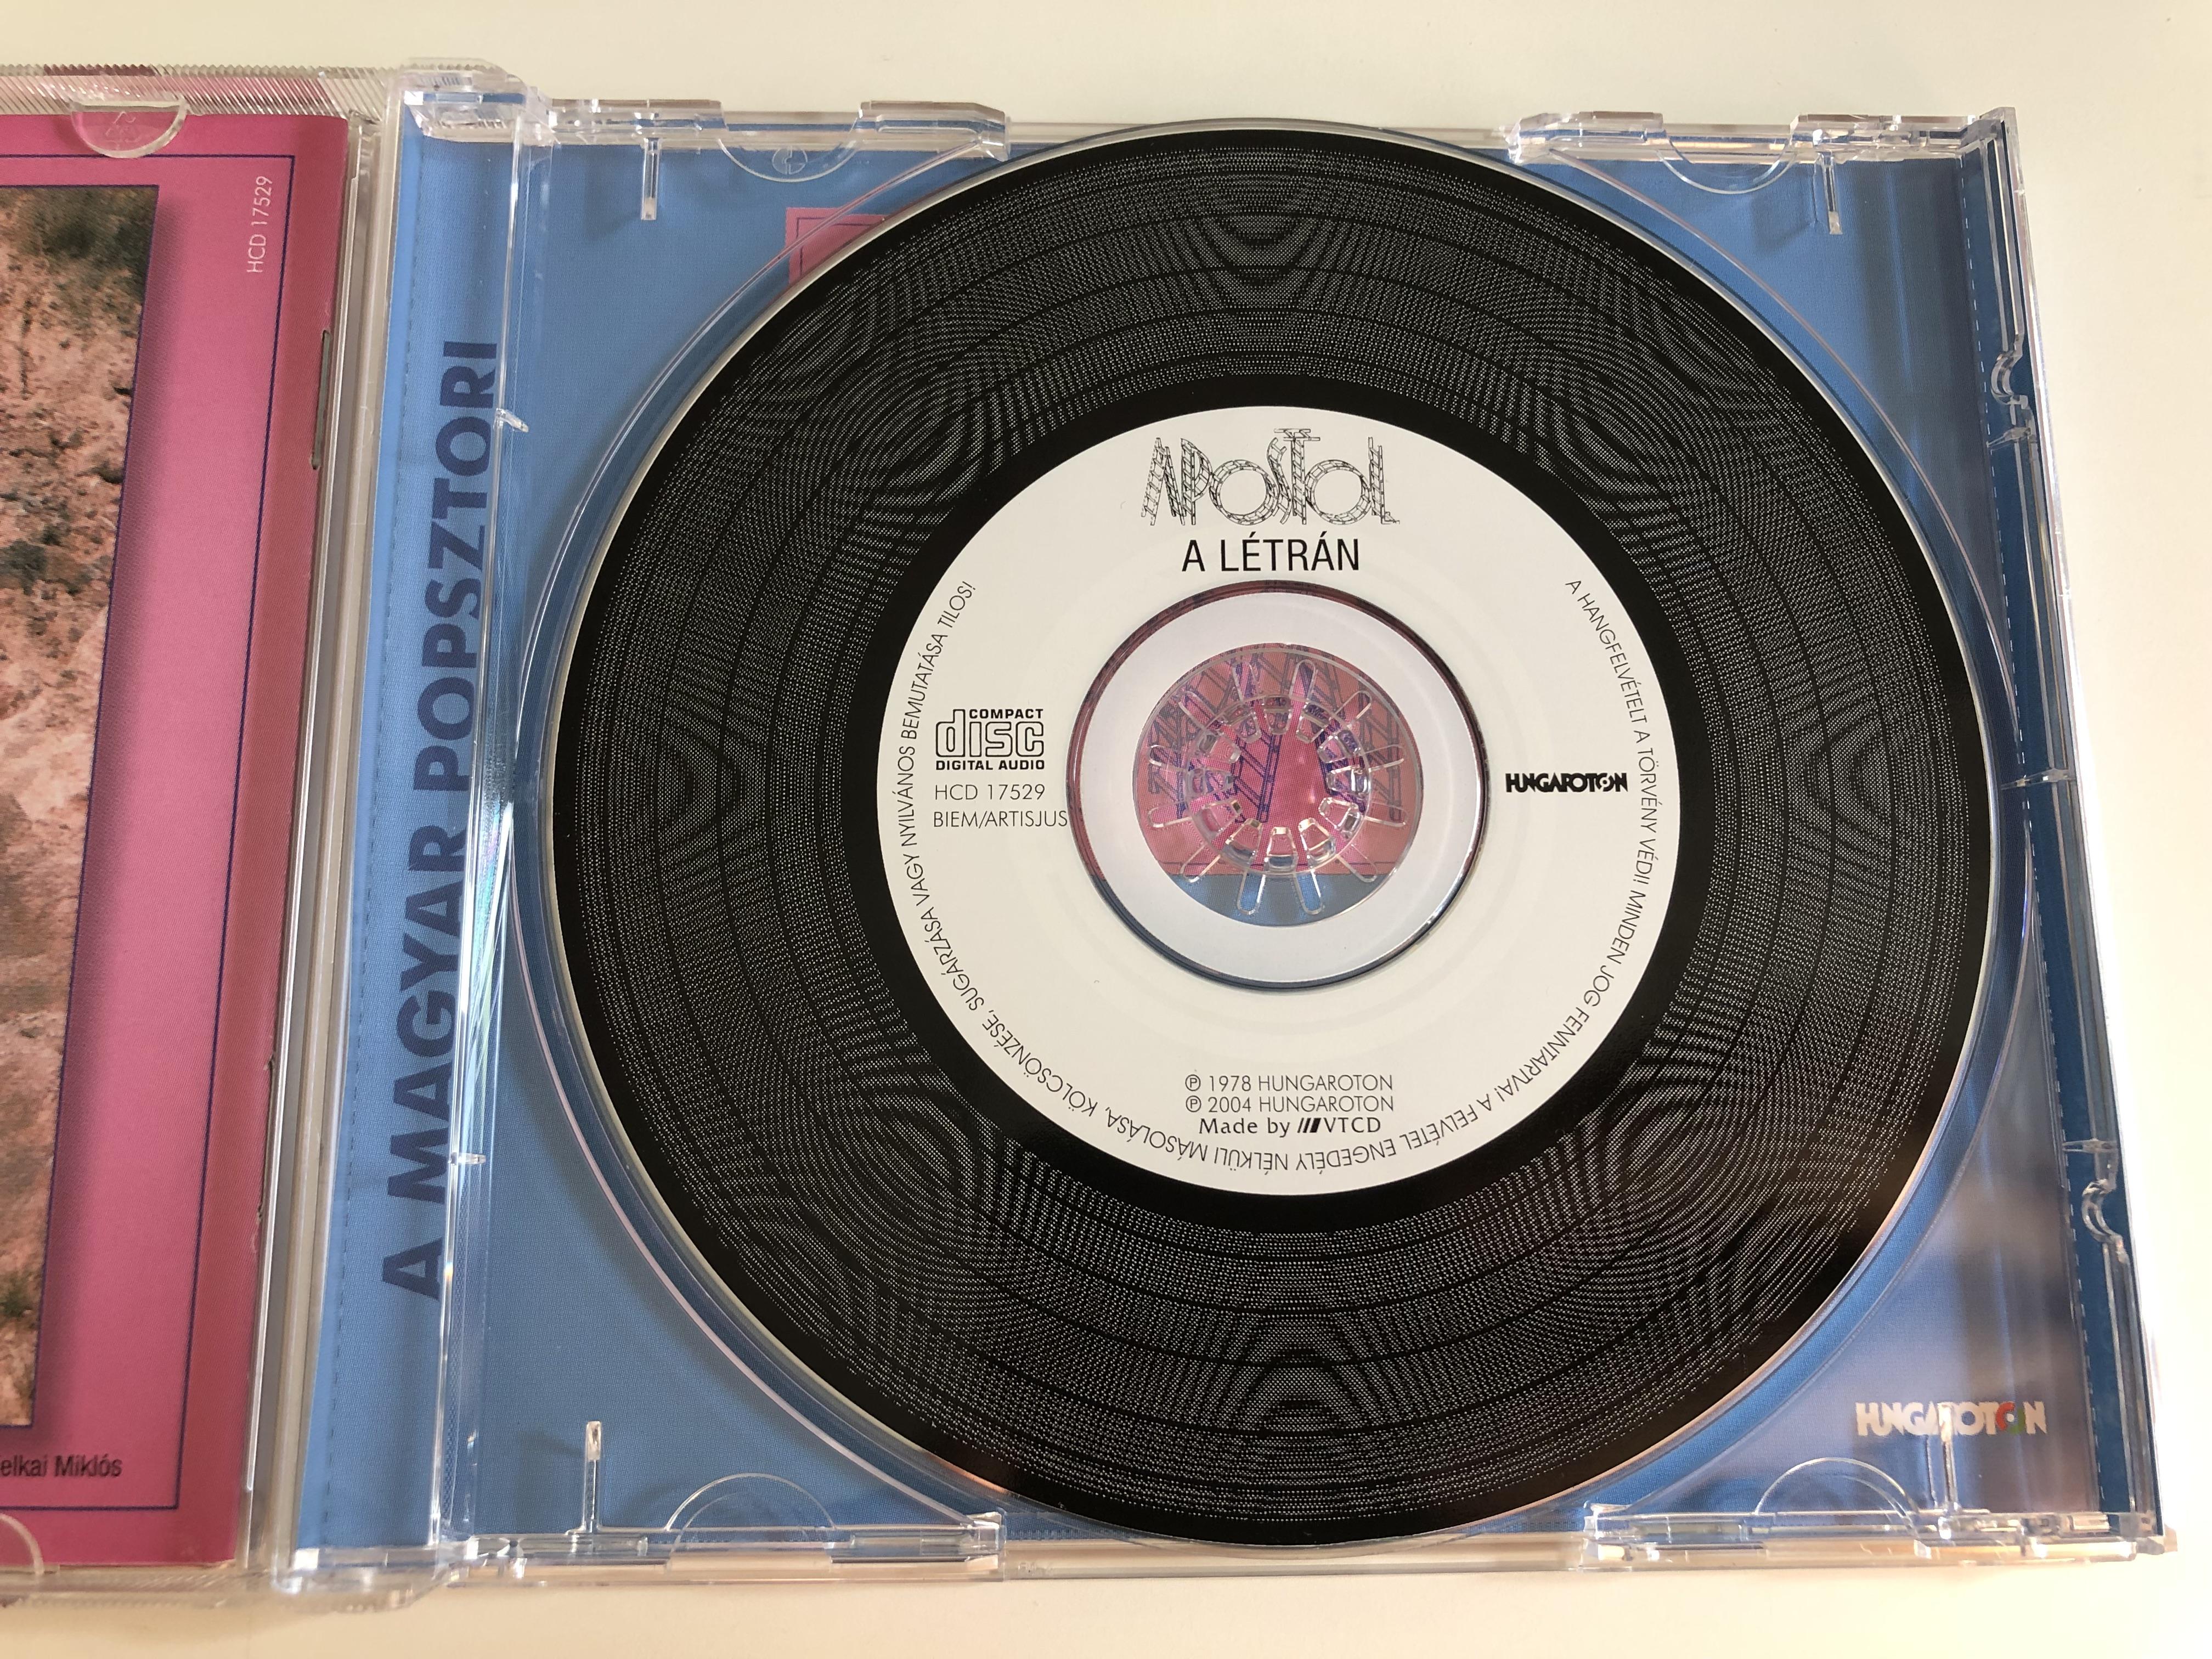 apostol-a-l-tr-n-a-magyar-popsztori-hungarian-pop-band-audio-cd-2004-hungaroton-hcd-17529-7-.jpg